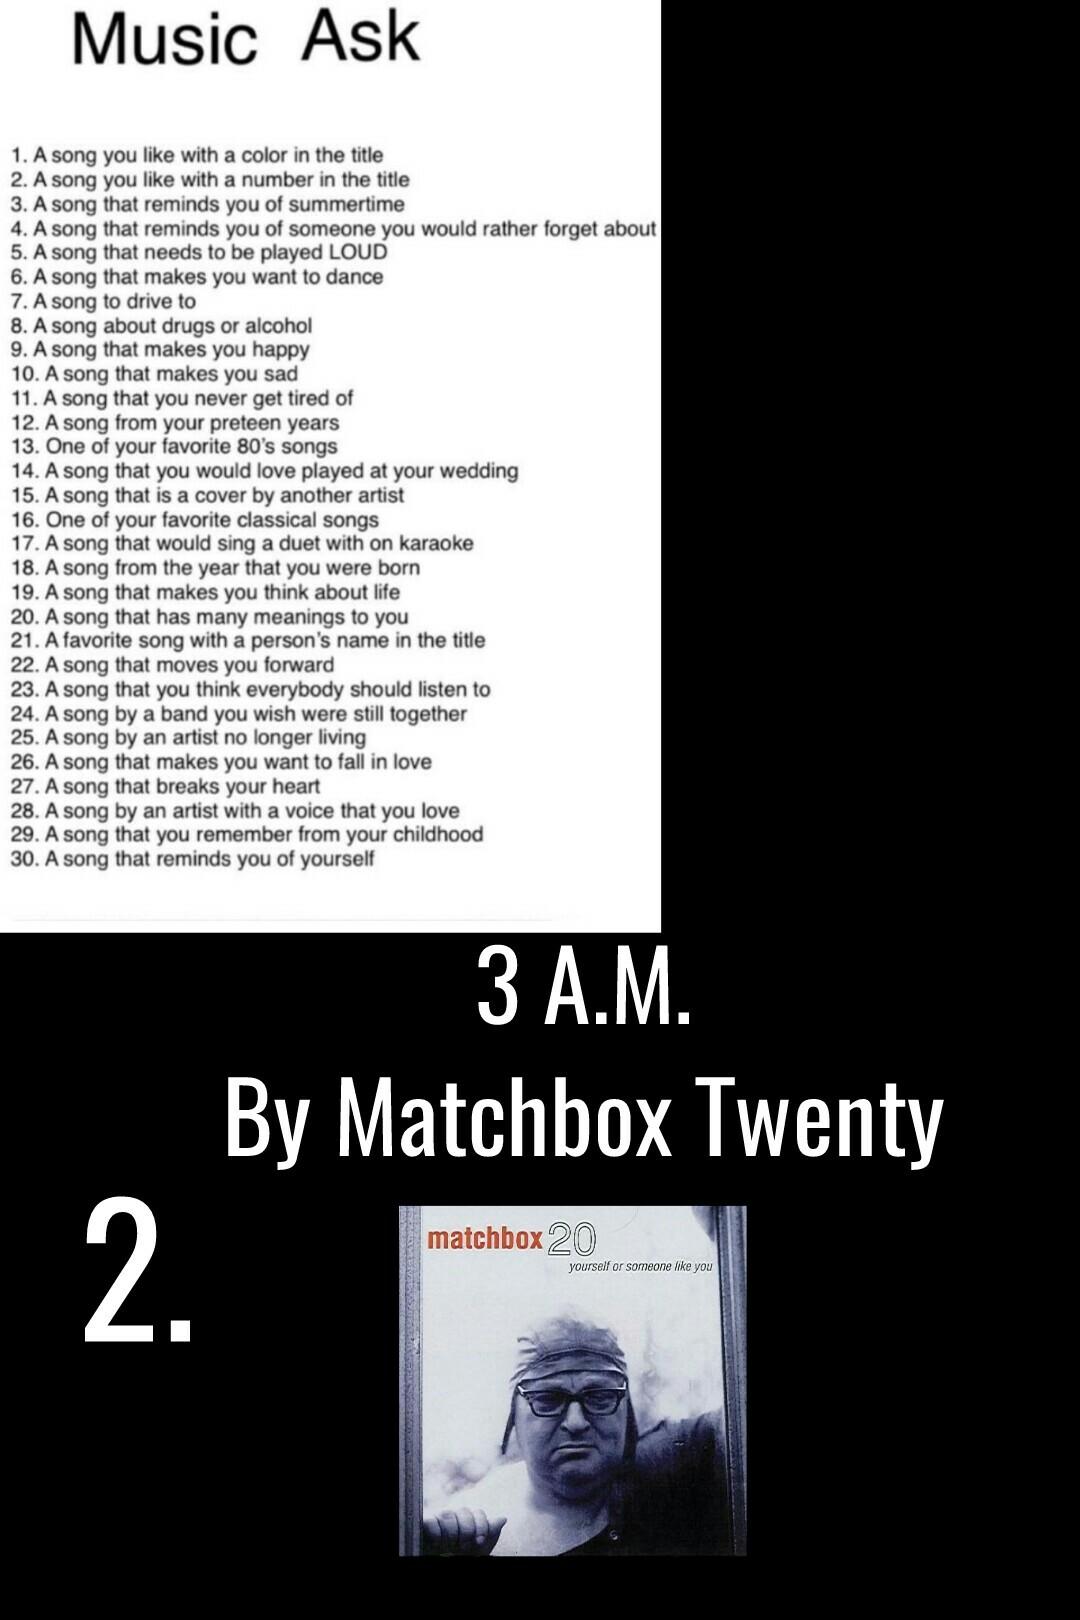 2-3 A.M. By Matchbox Twenty